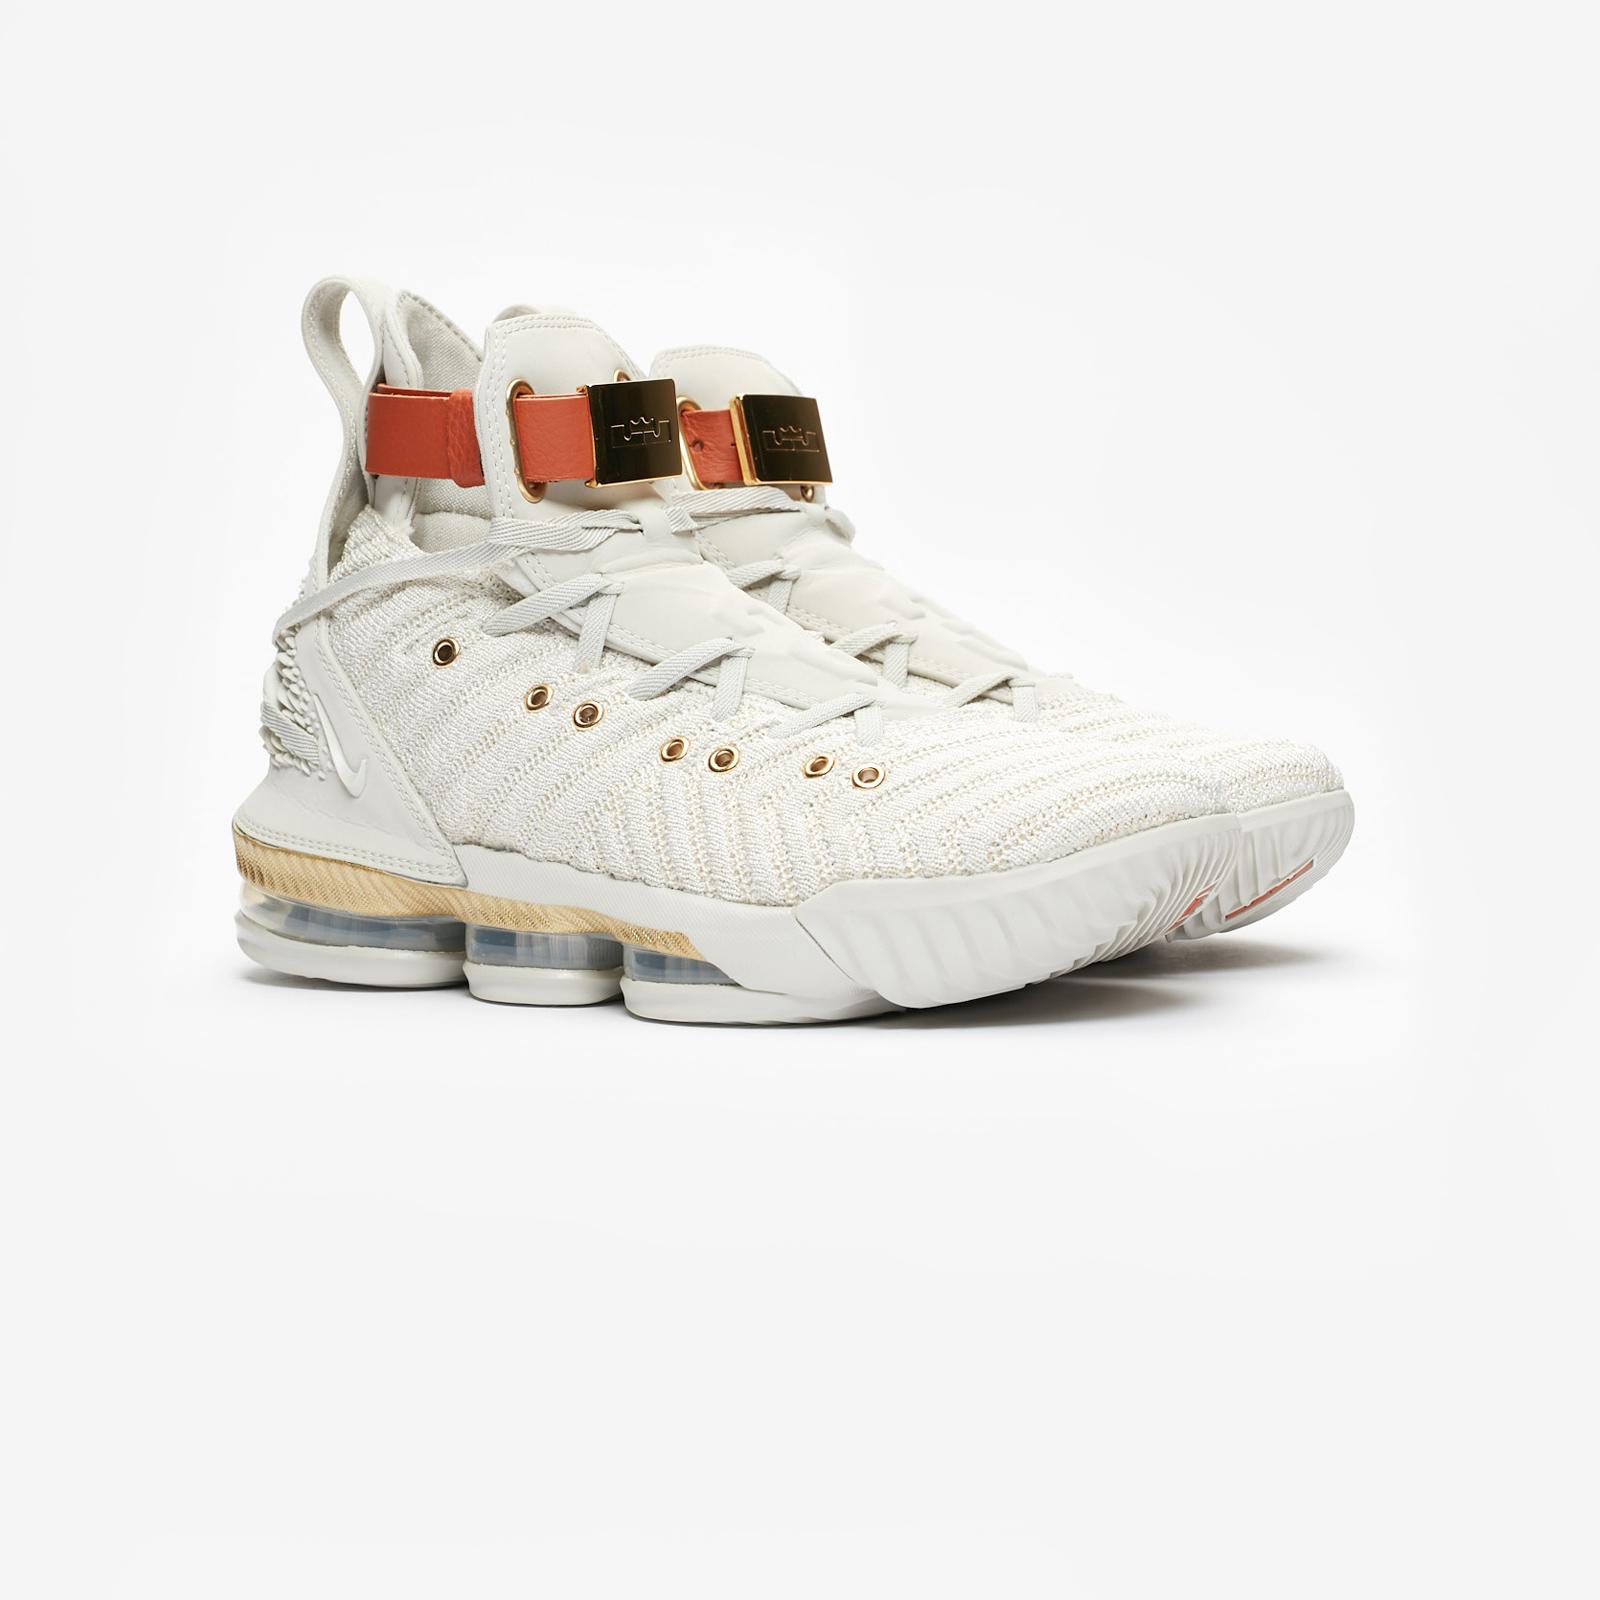 30ec5353e7d2e2 Nike Wmns LeBron XVI LMTD - Bq6583-100 - Sneakersnstuff